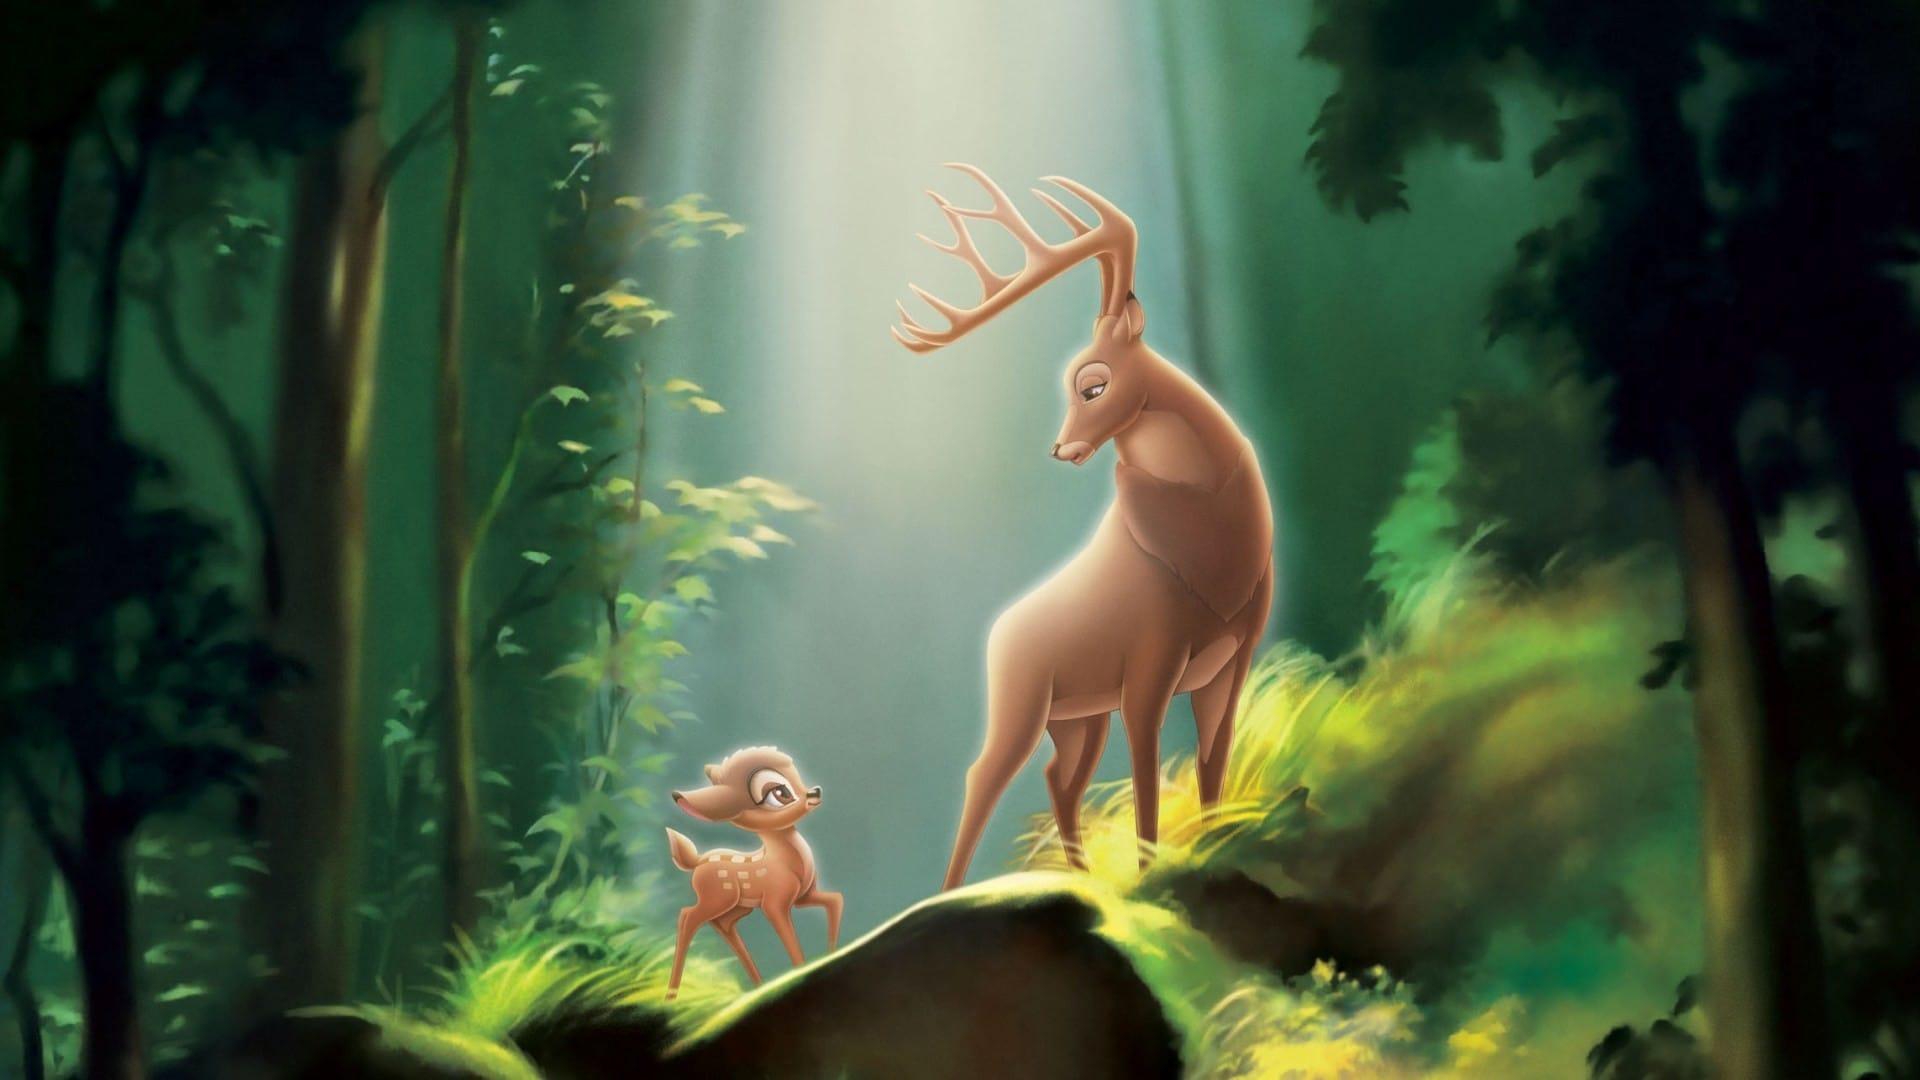 Bambi 2 wallpaper